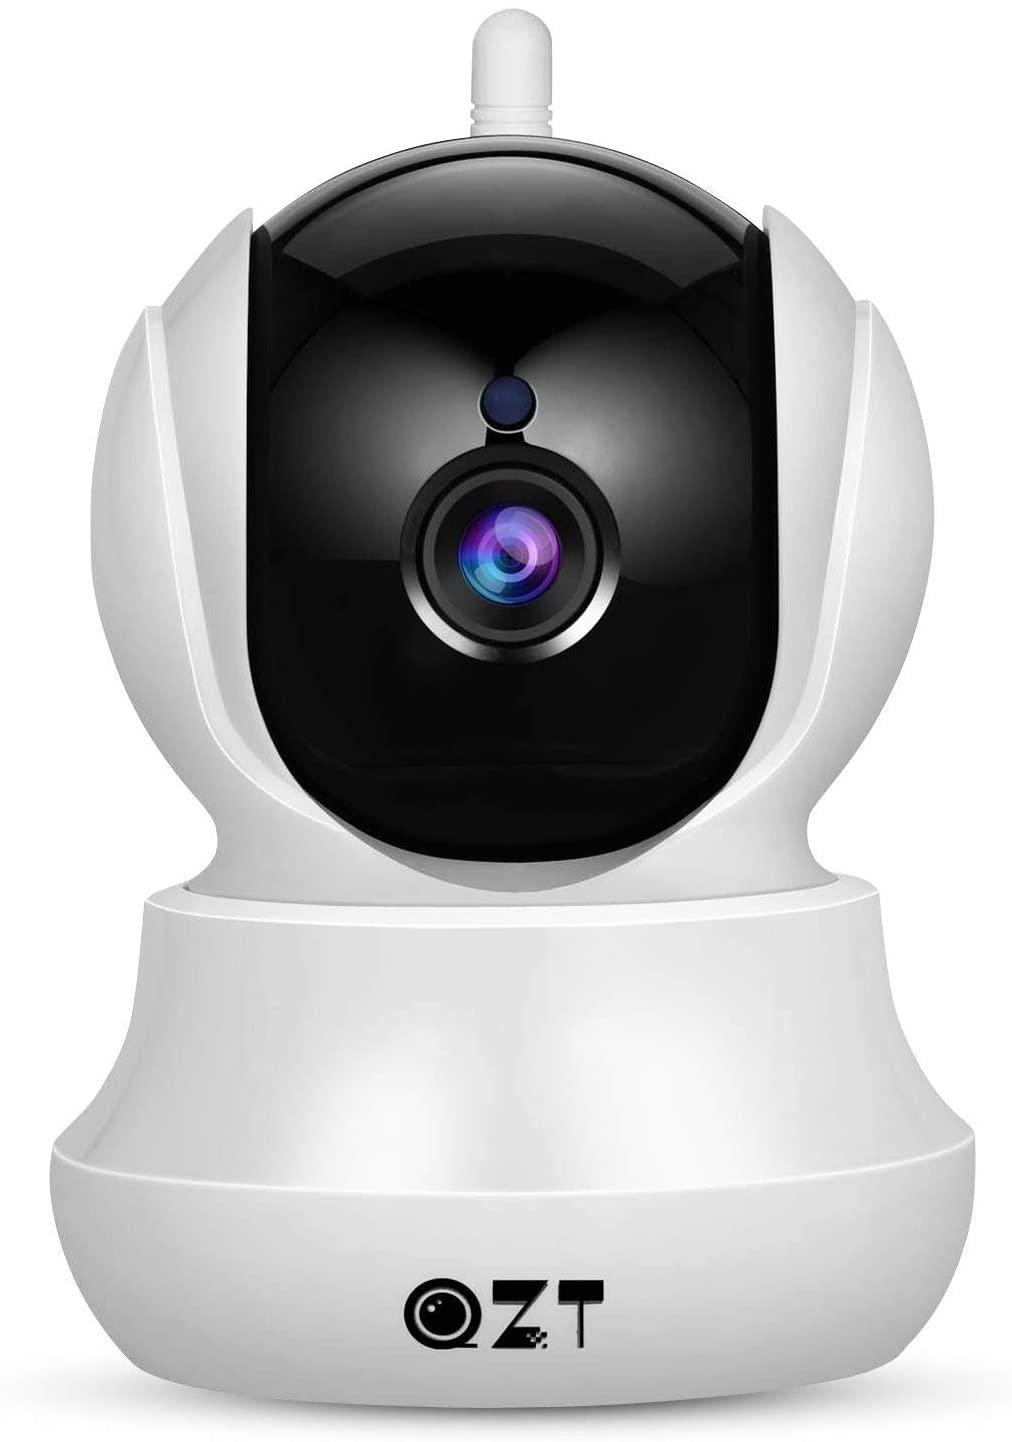 Cámara IP, Cámara de Vigilancia QZT 1080P Wifi